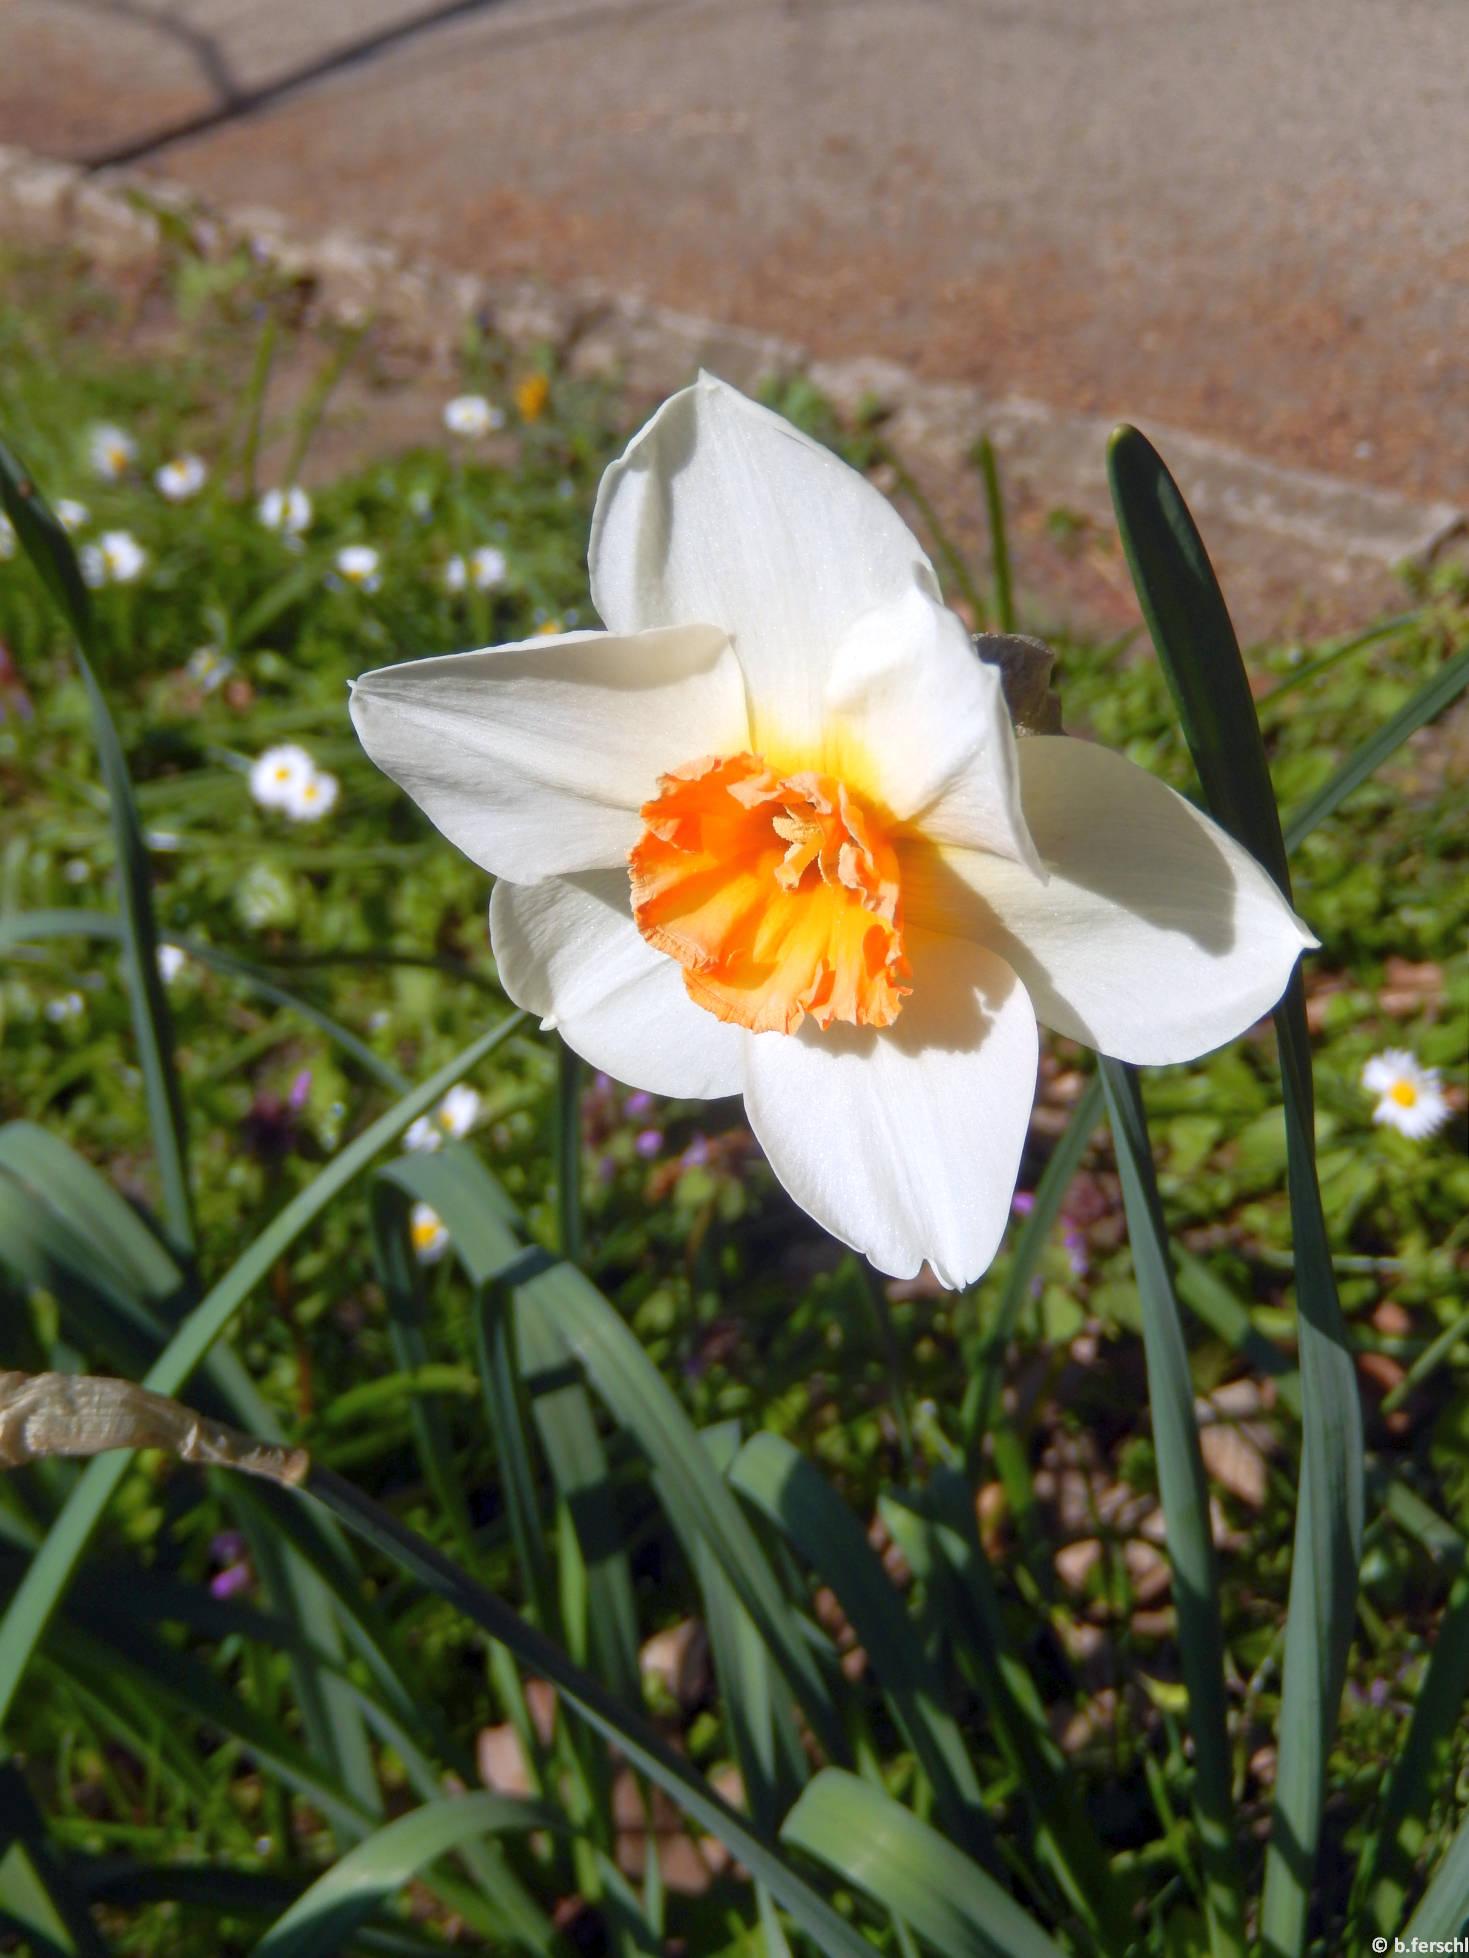 Narcissus 'Barett Browning'